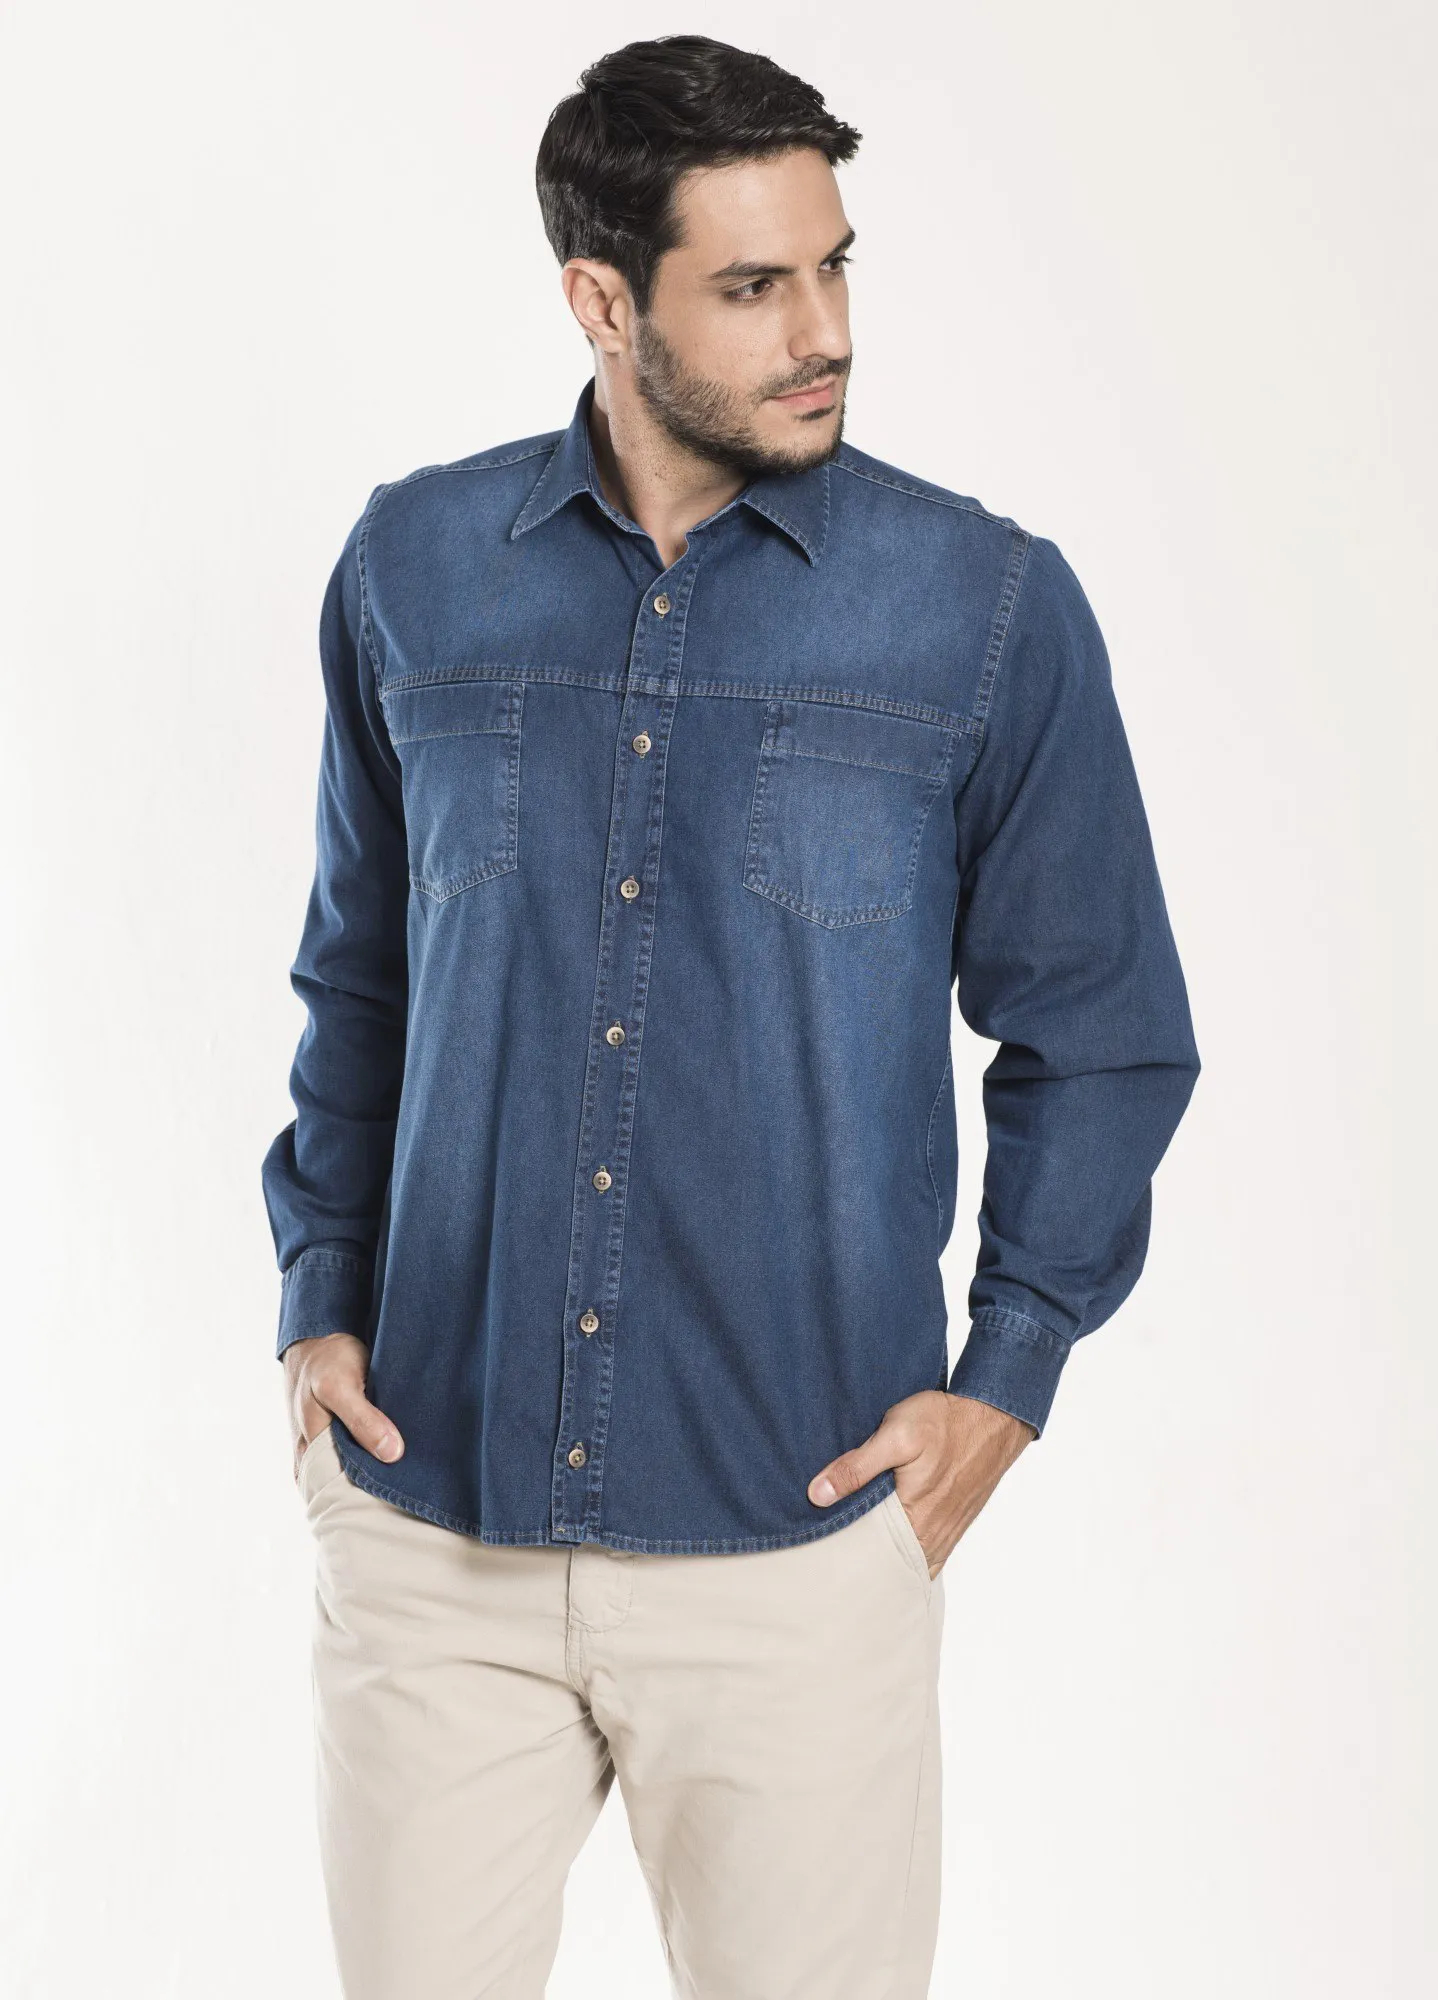 Camisa Jeans Masculina Tradicional